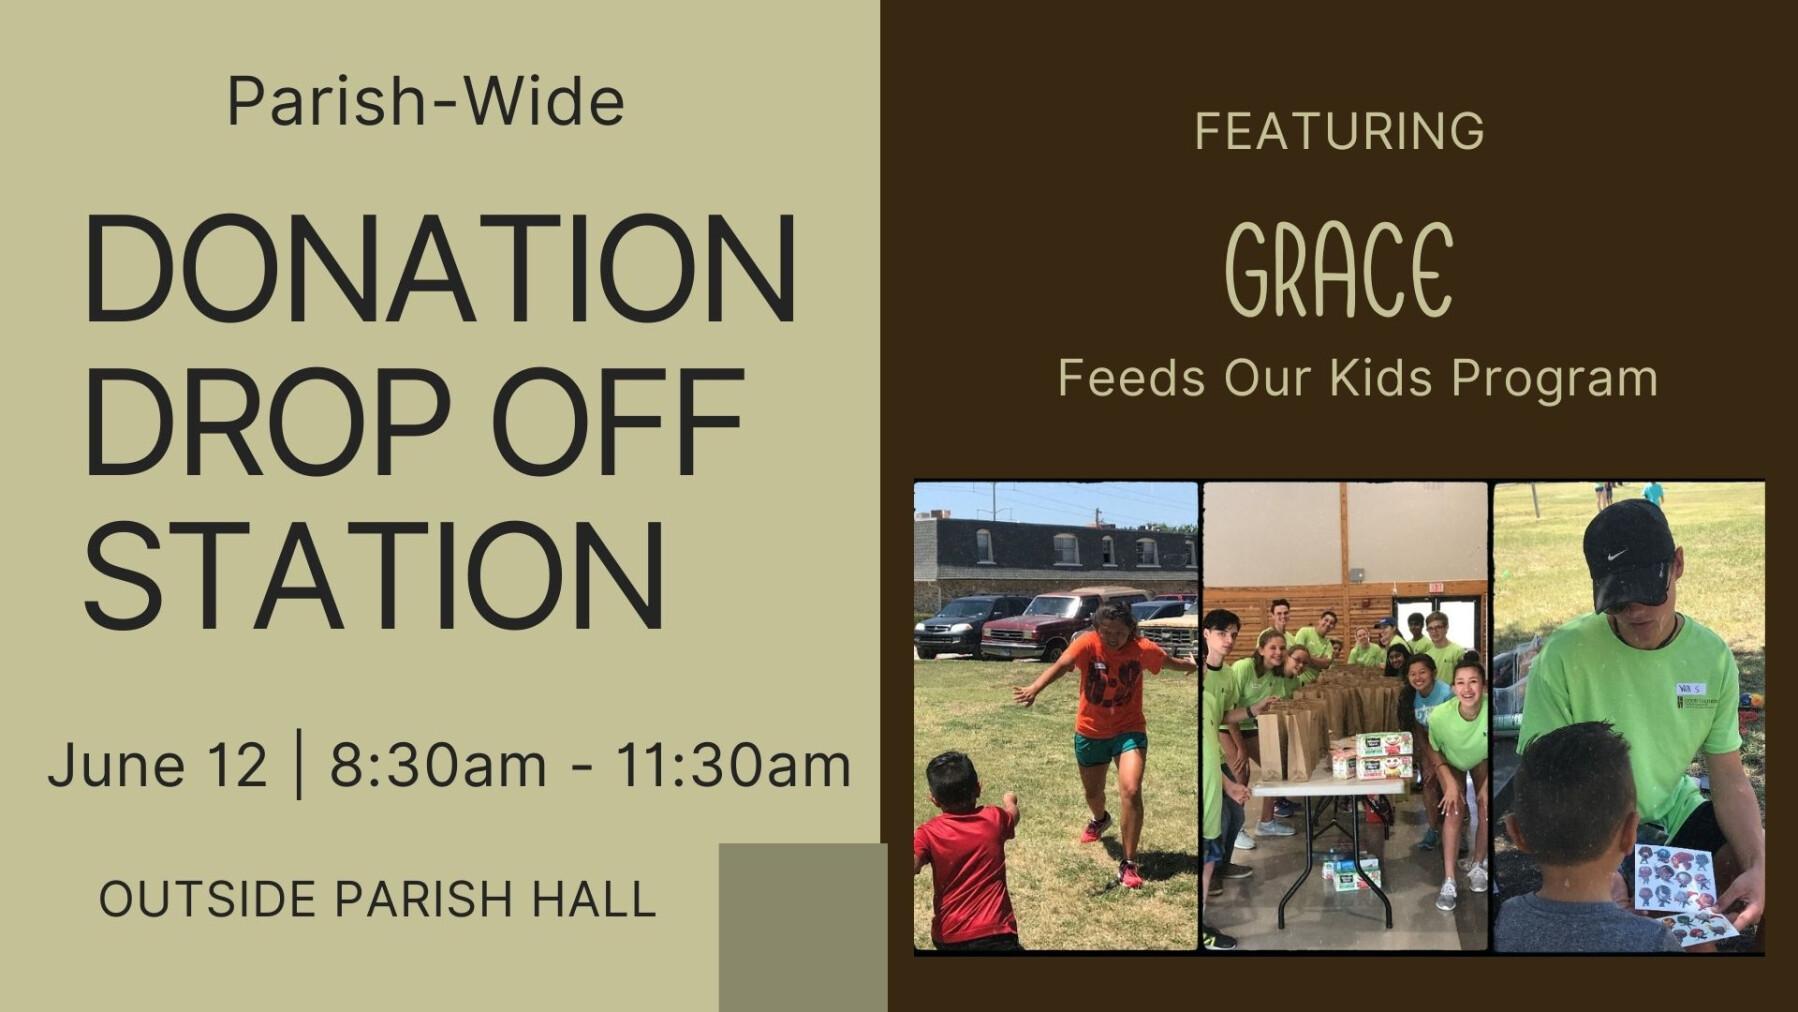 Parish-Wide Donation Drop Off Station